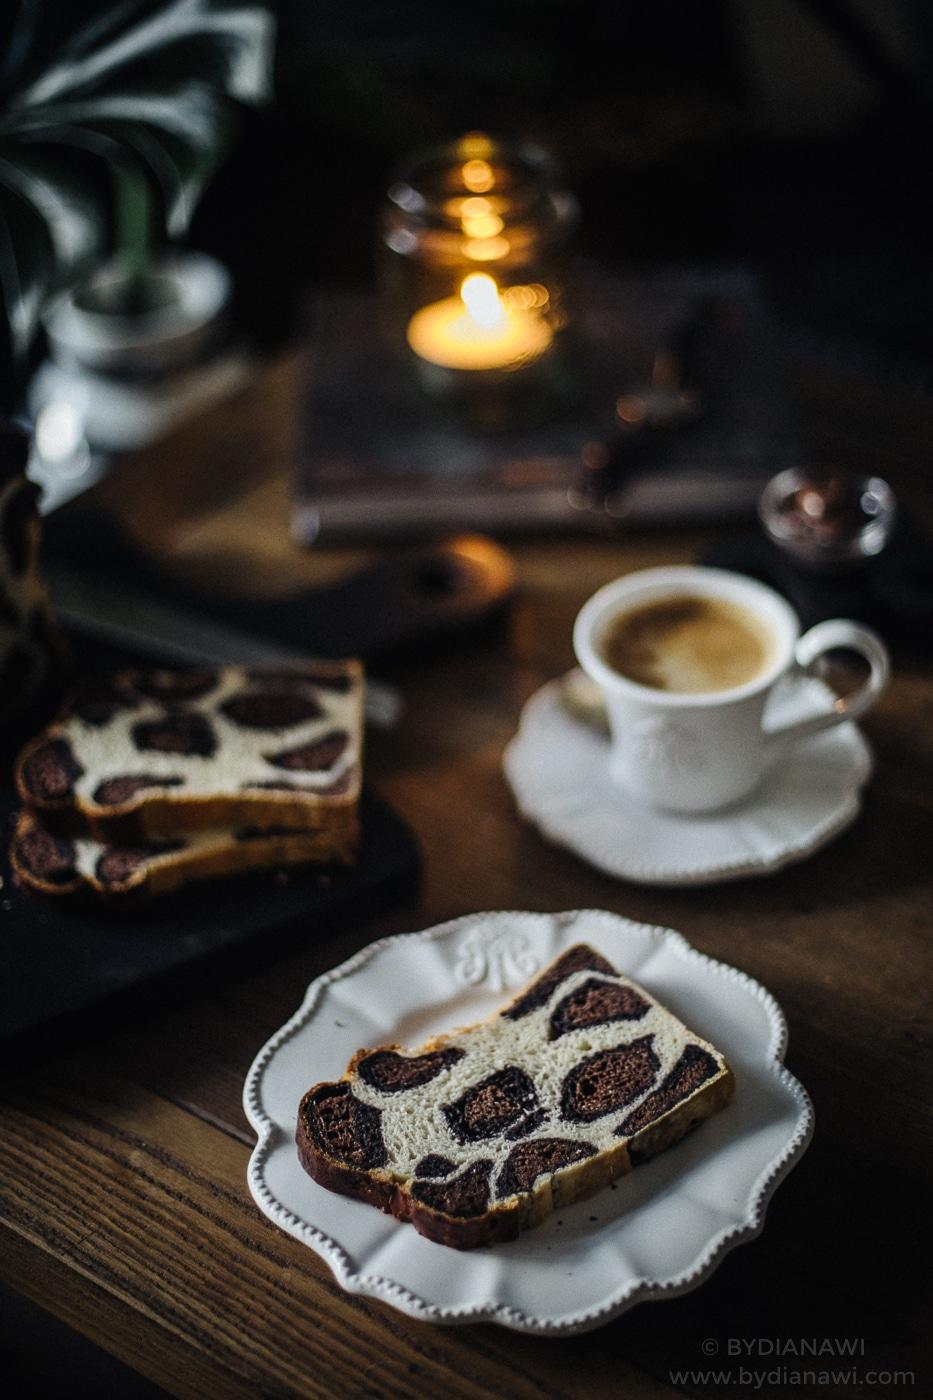 leopardbrød, brioche brød, franskbrød, veninder, brunch